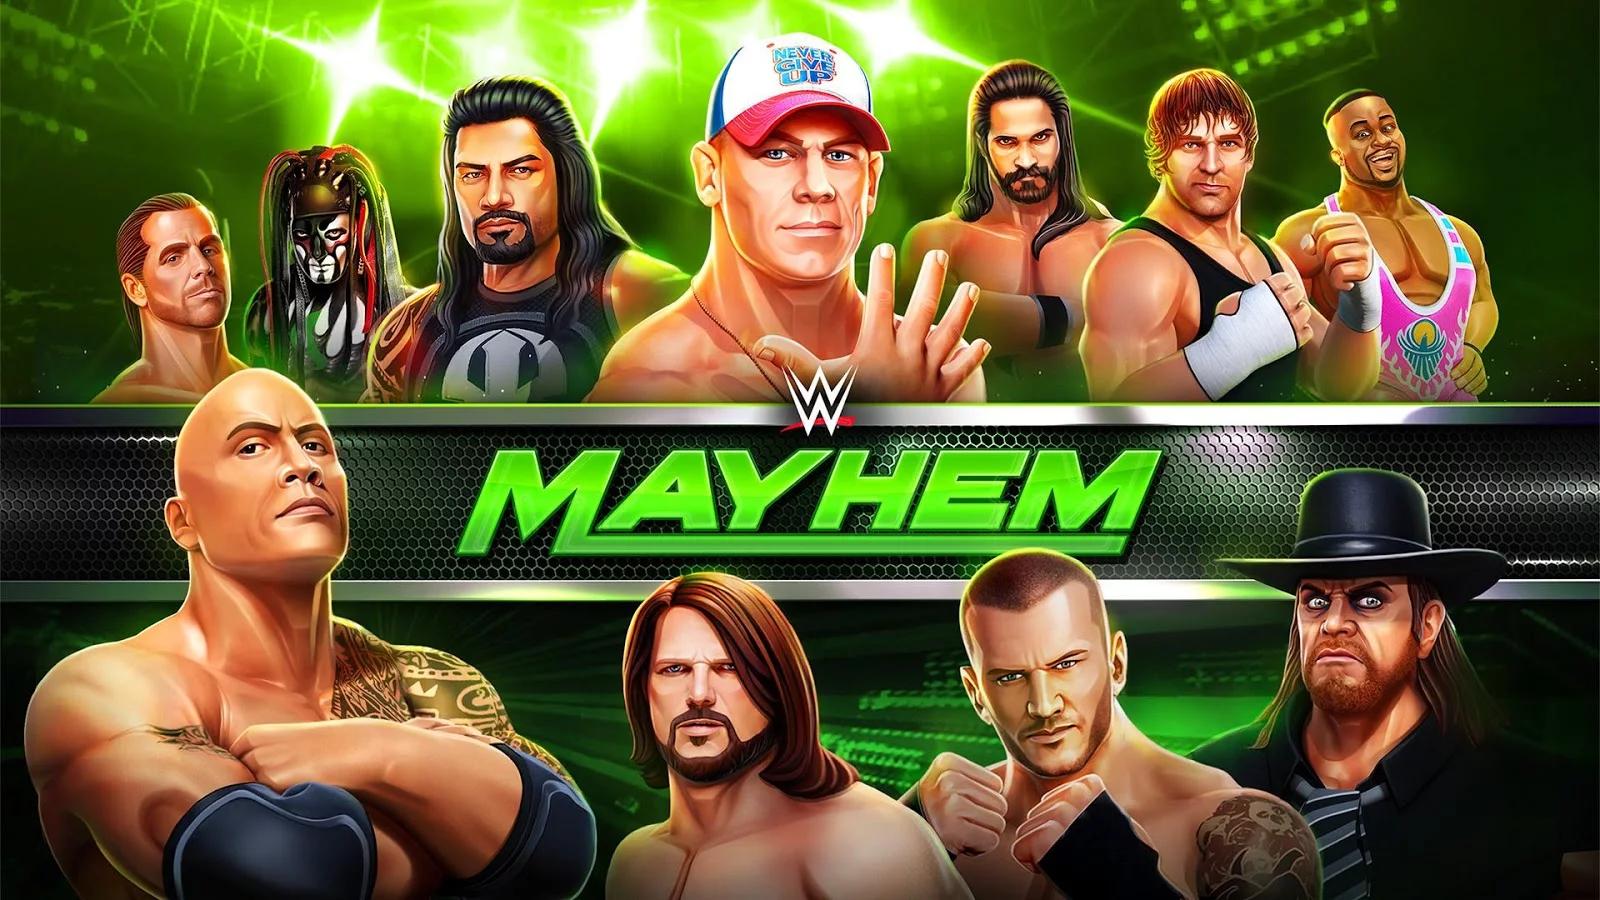 WWE Mayhem on PC